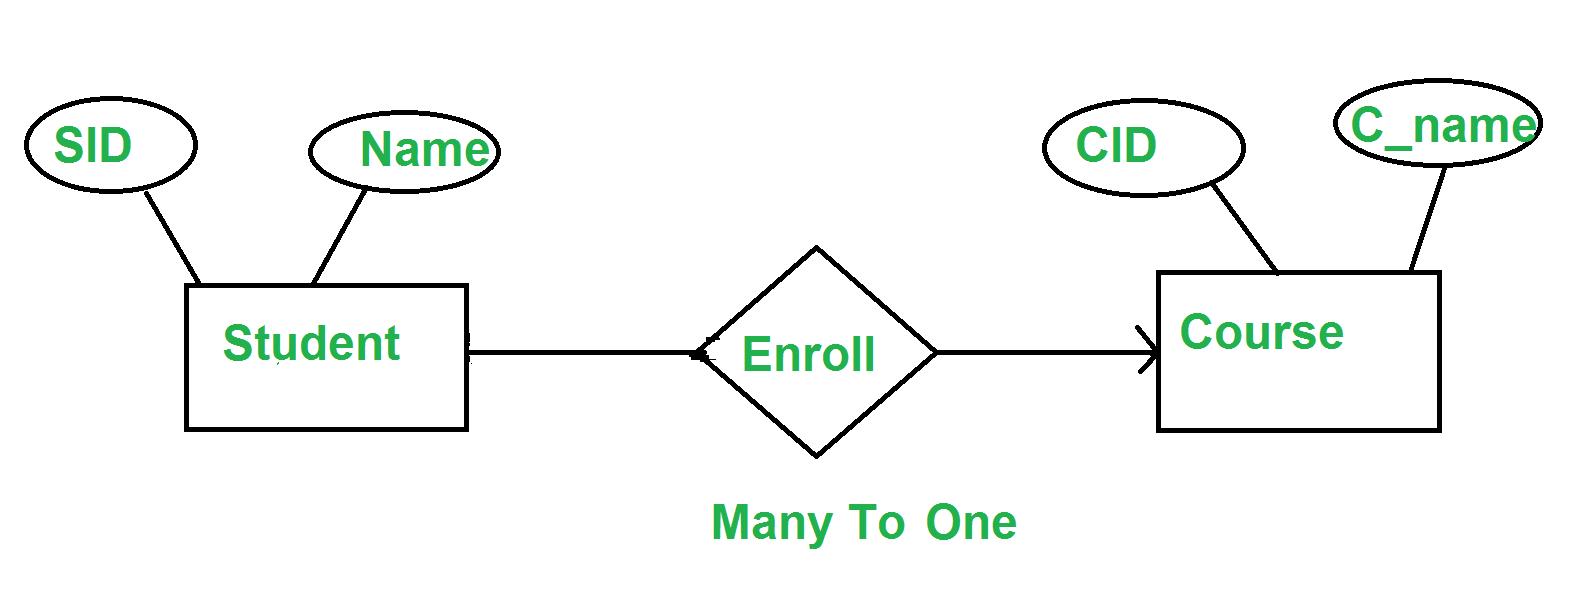 Minimization Of Er Diagram - Geeksforgeeks within Ternary Relationship Er Diagram Examples